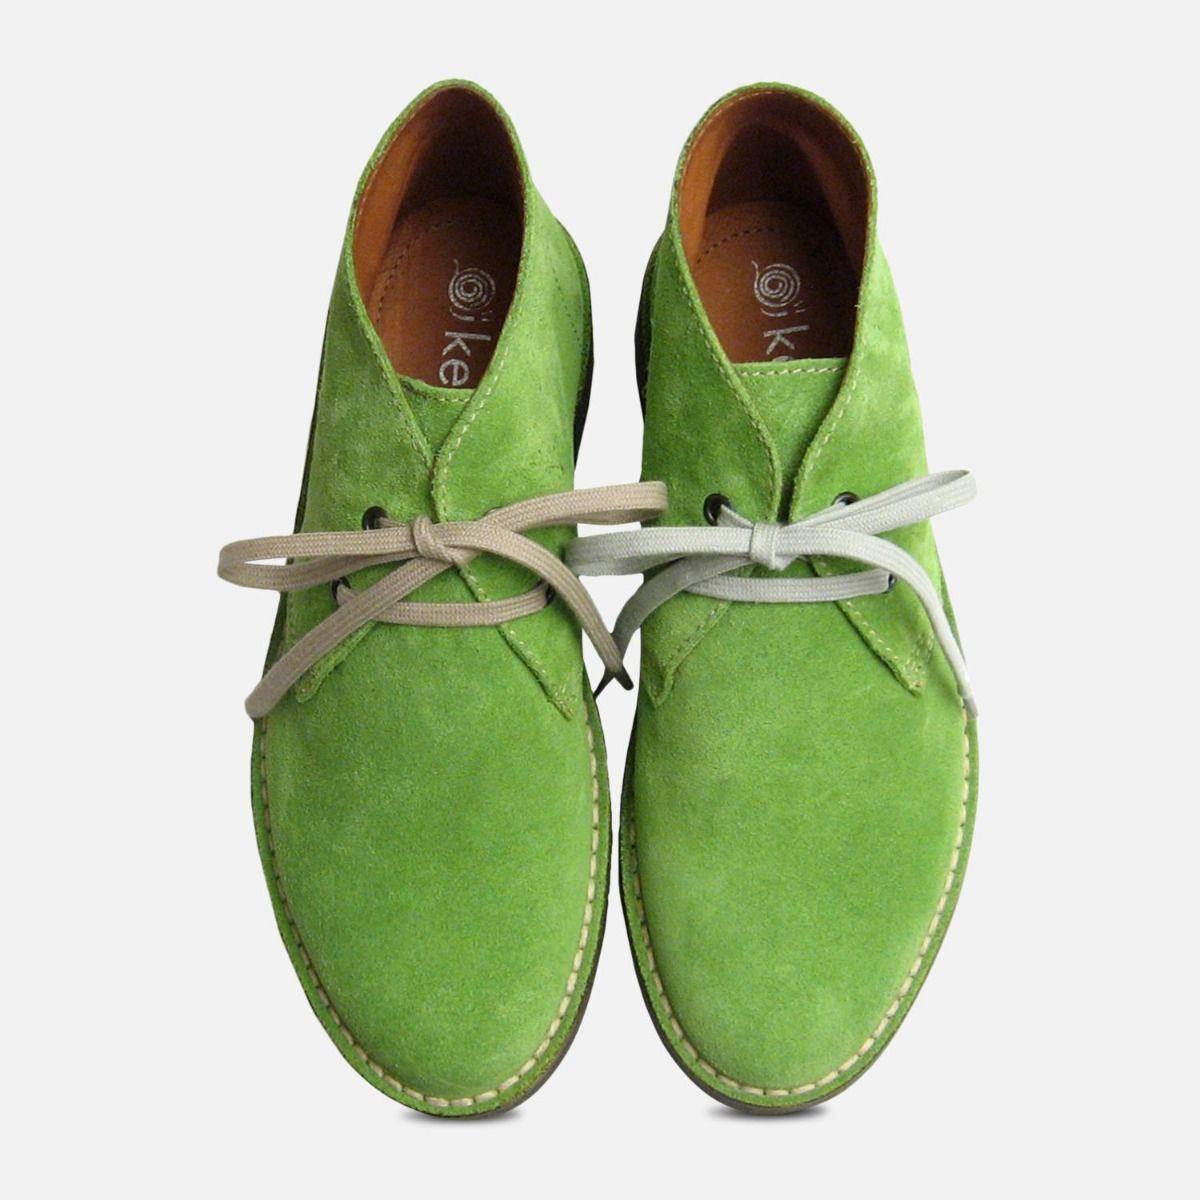 Lime Green Suede Italian Arthur Knight Desert Boots